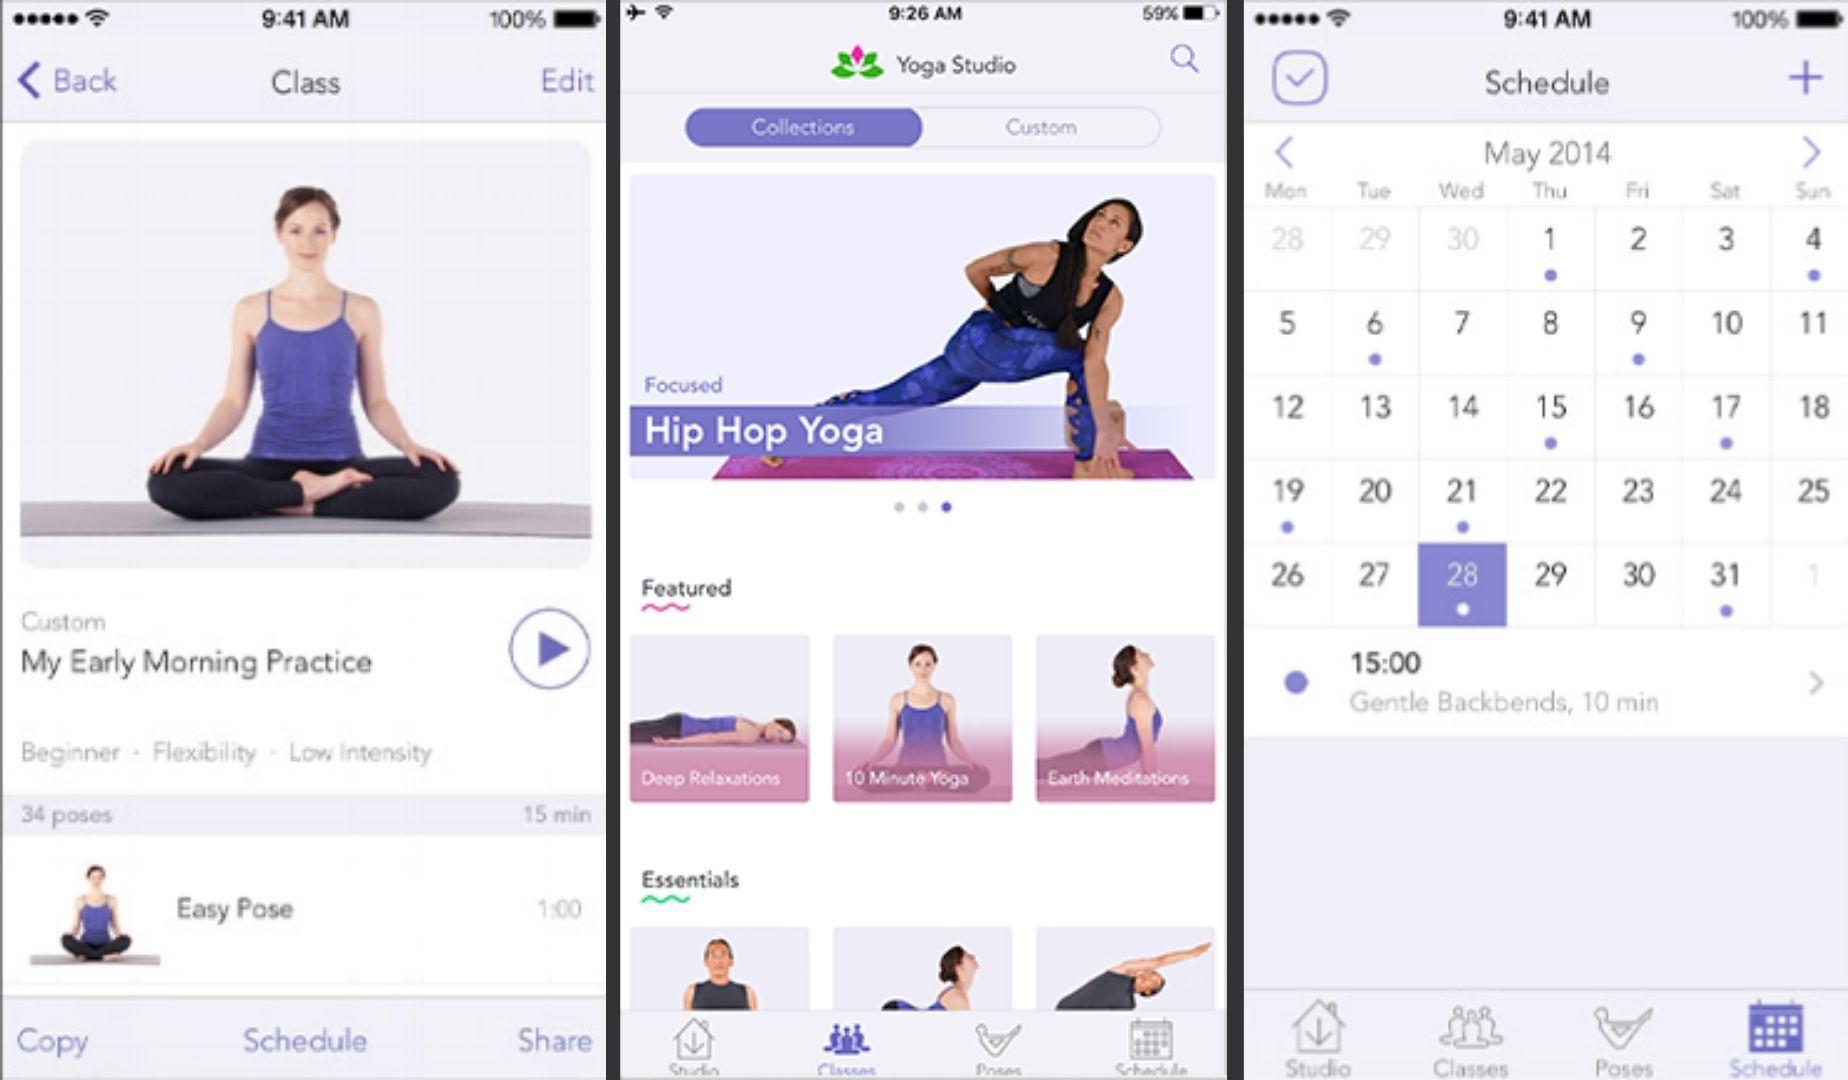 Three screenshots of the Yoga Studio app for iOS.